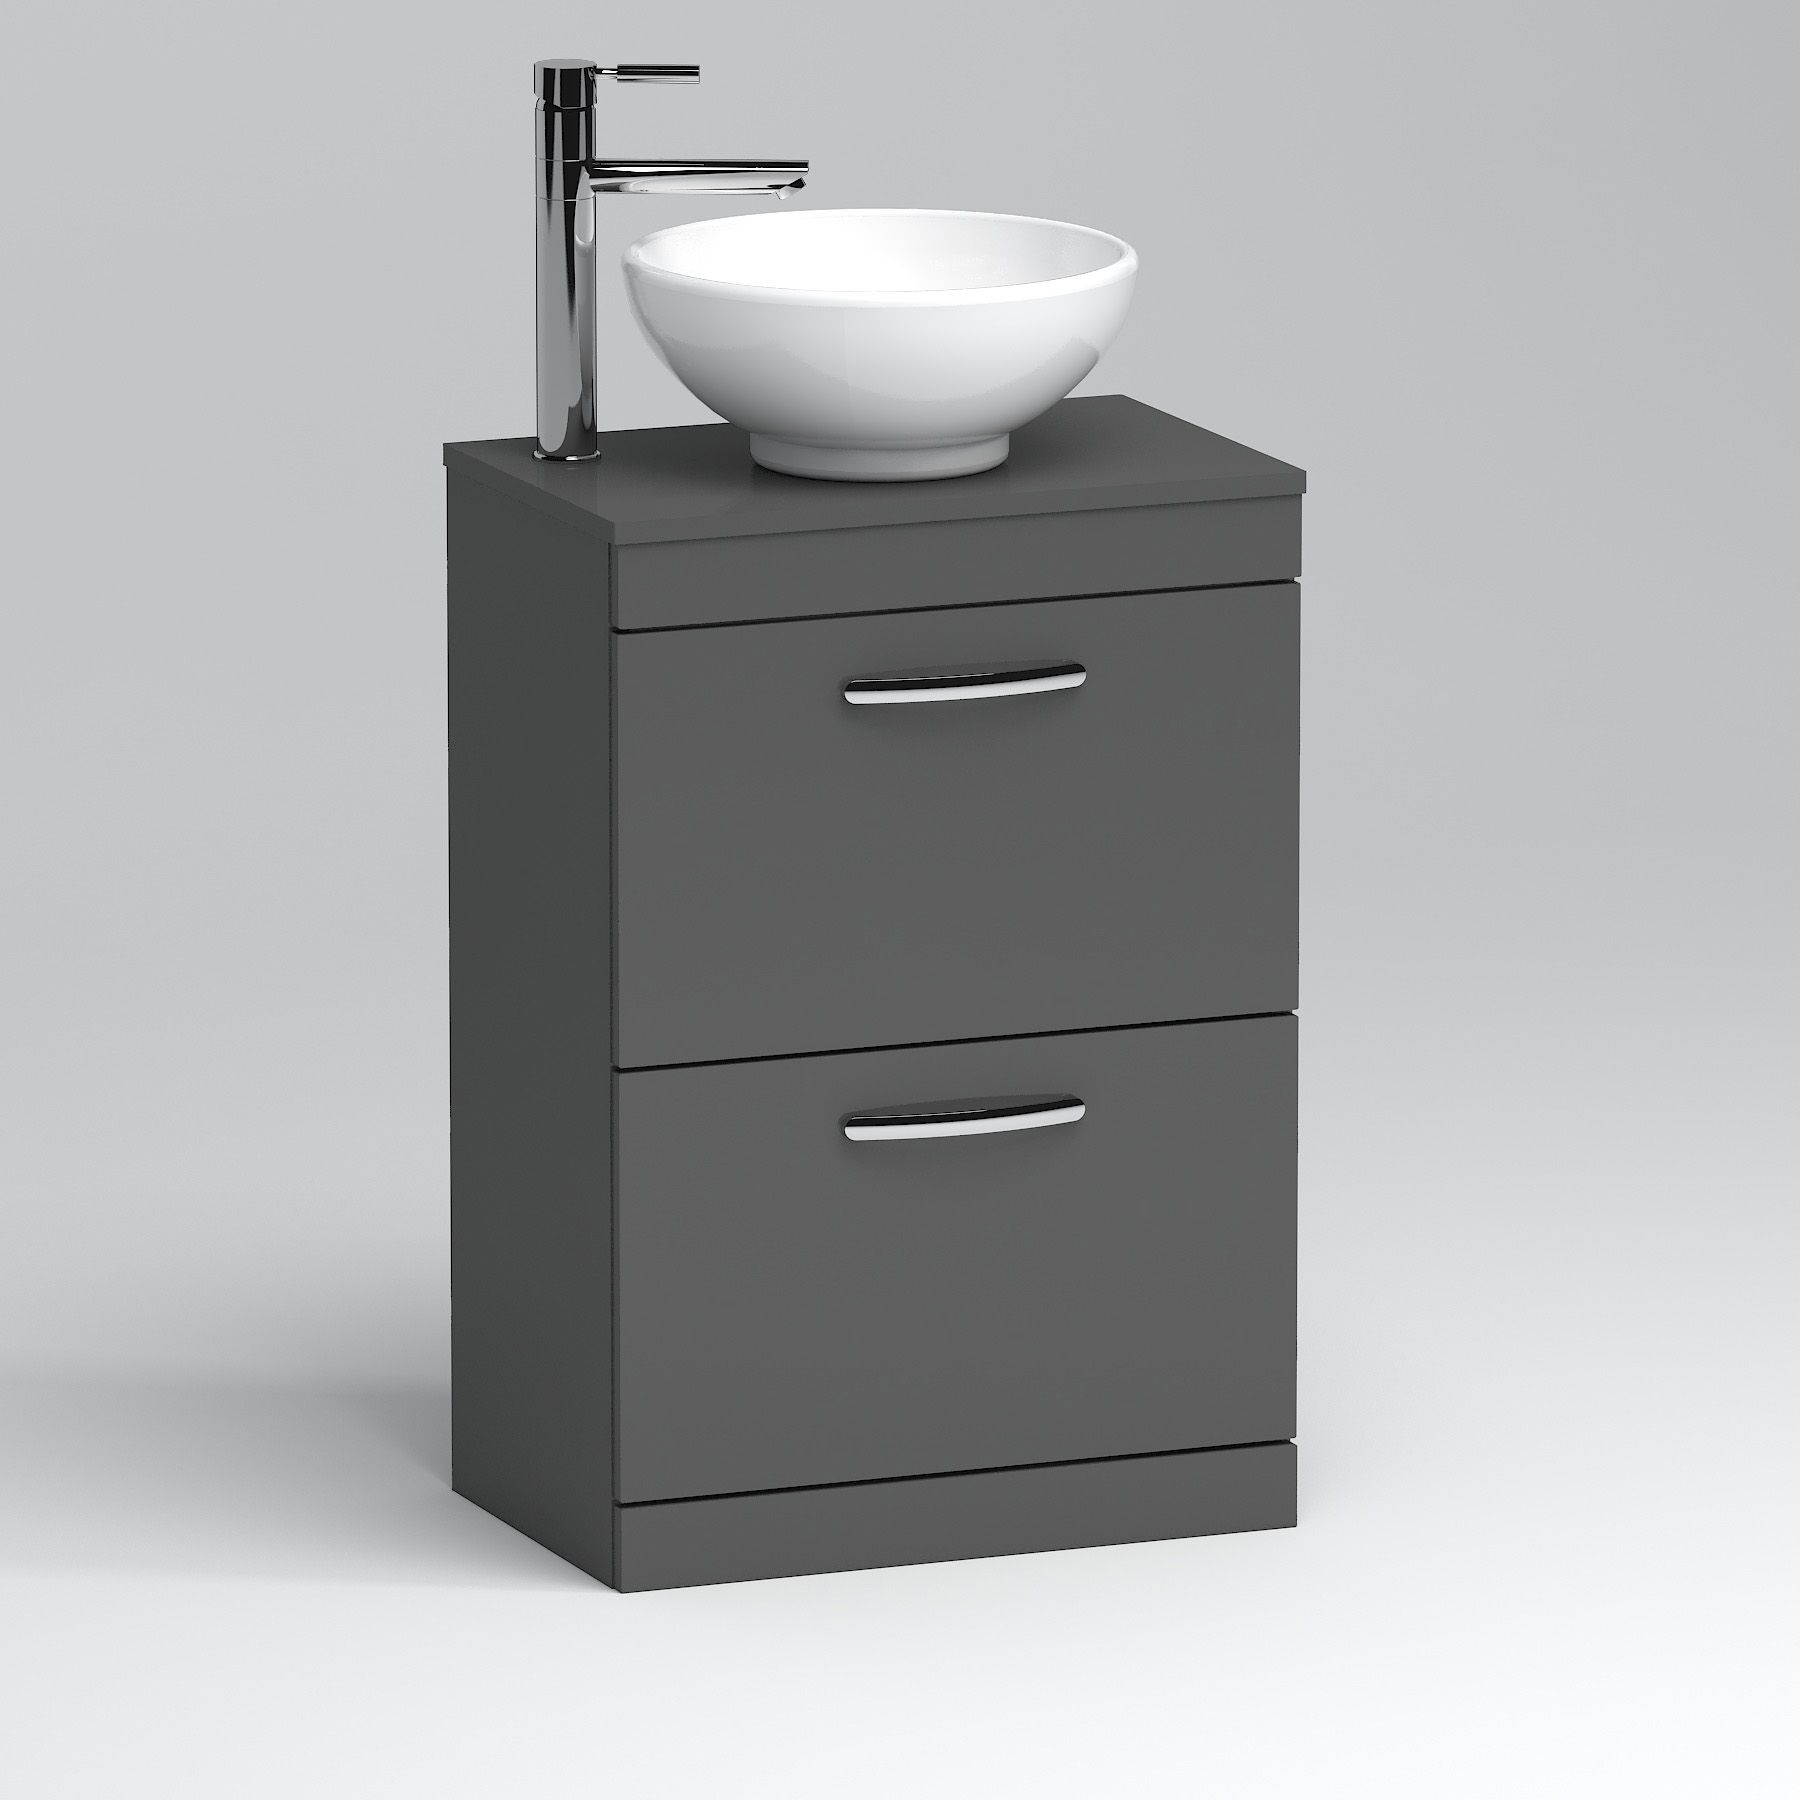 800mm Floor Standing Vanity Unit 2 Drawer Indigo Grey Gloss